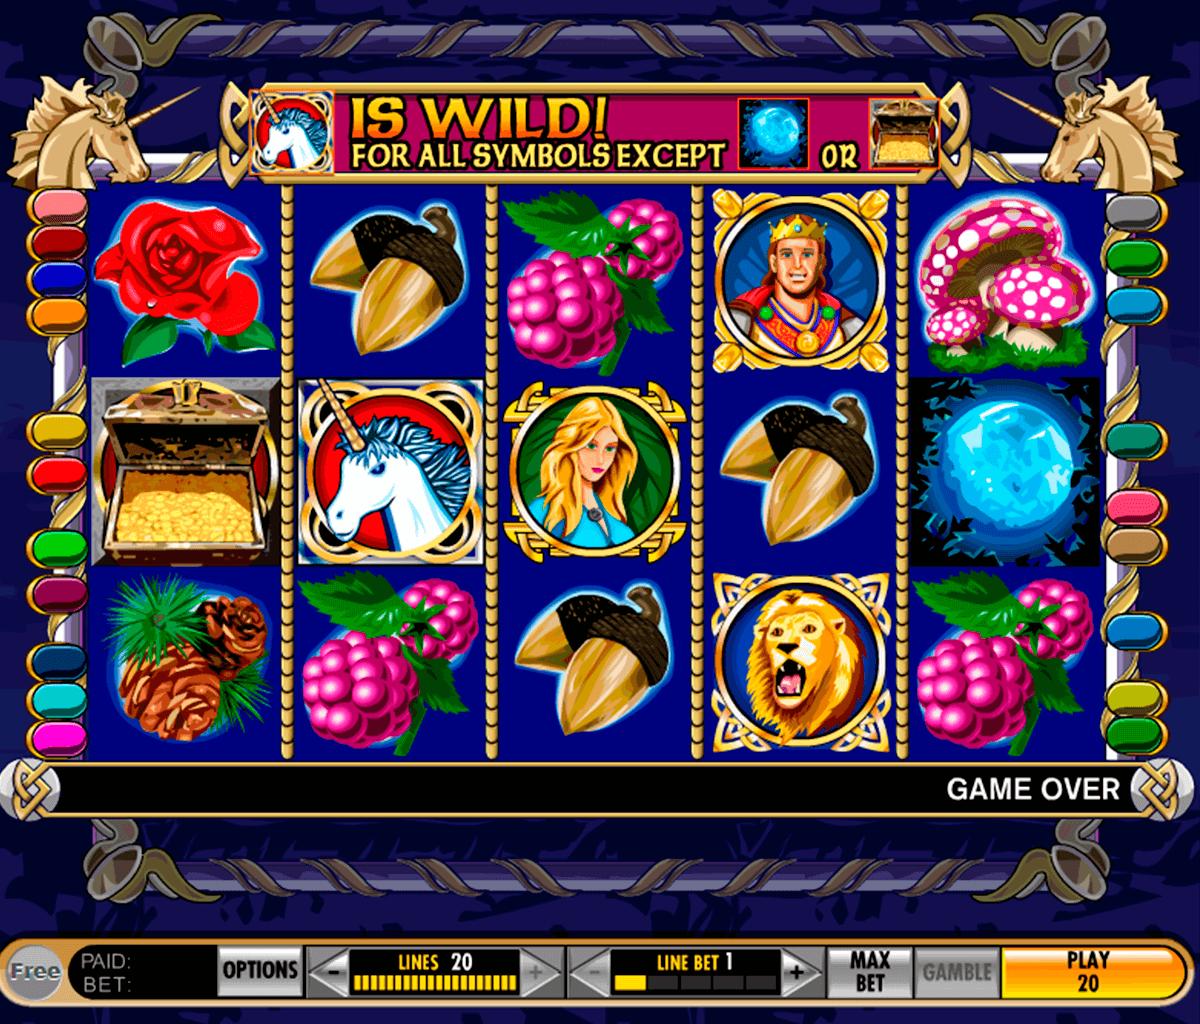 Casino en Suiza tragamonedas gratis pantalla completa-741565